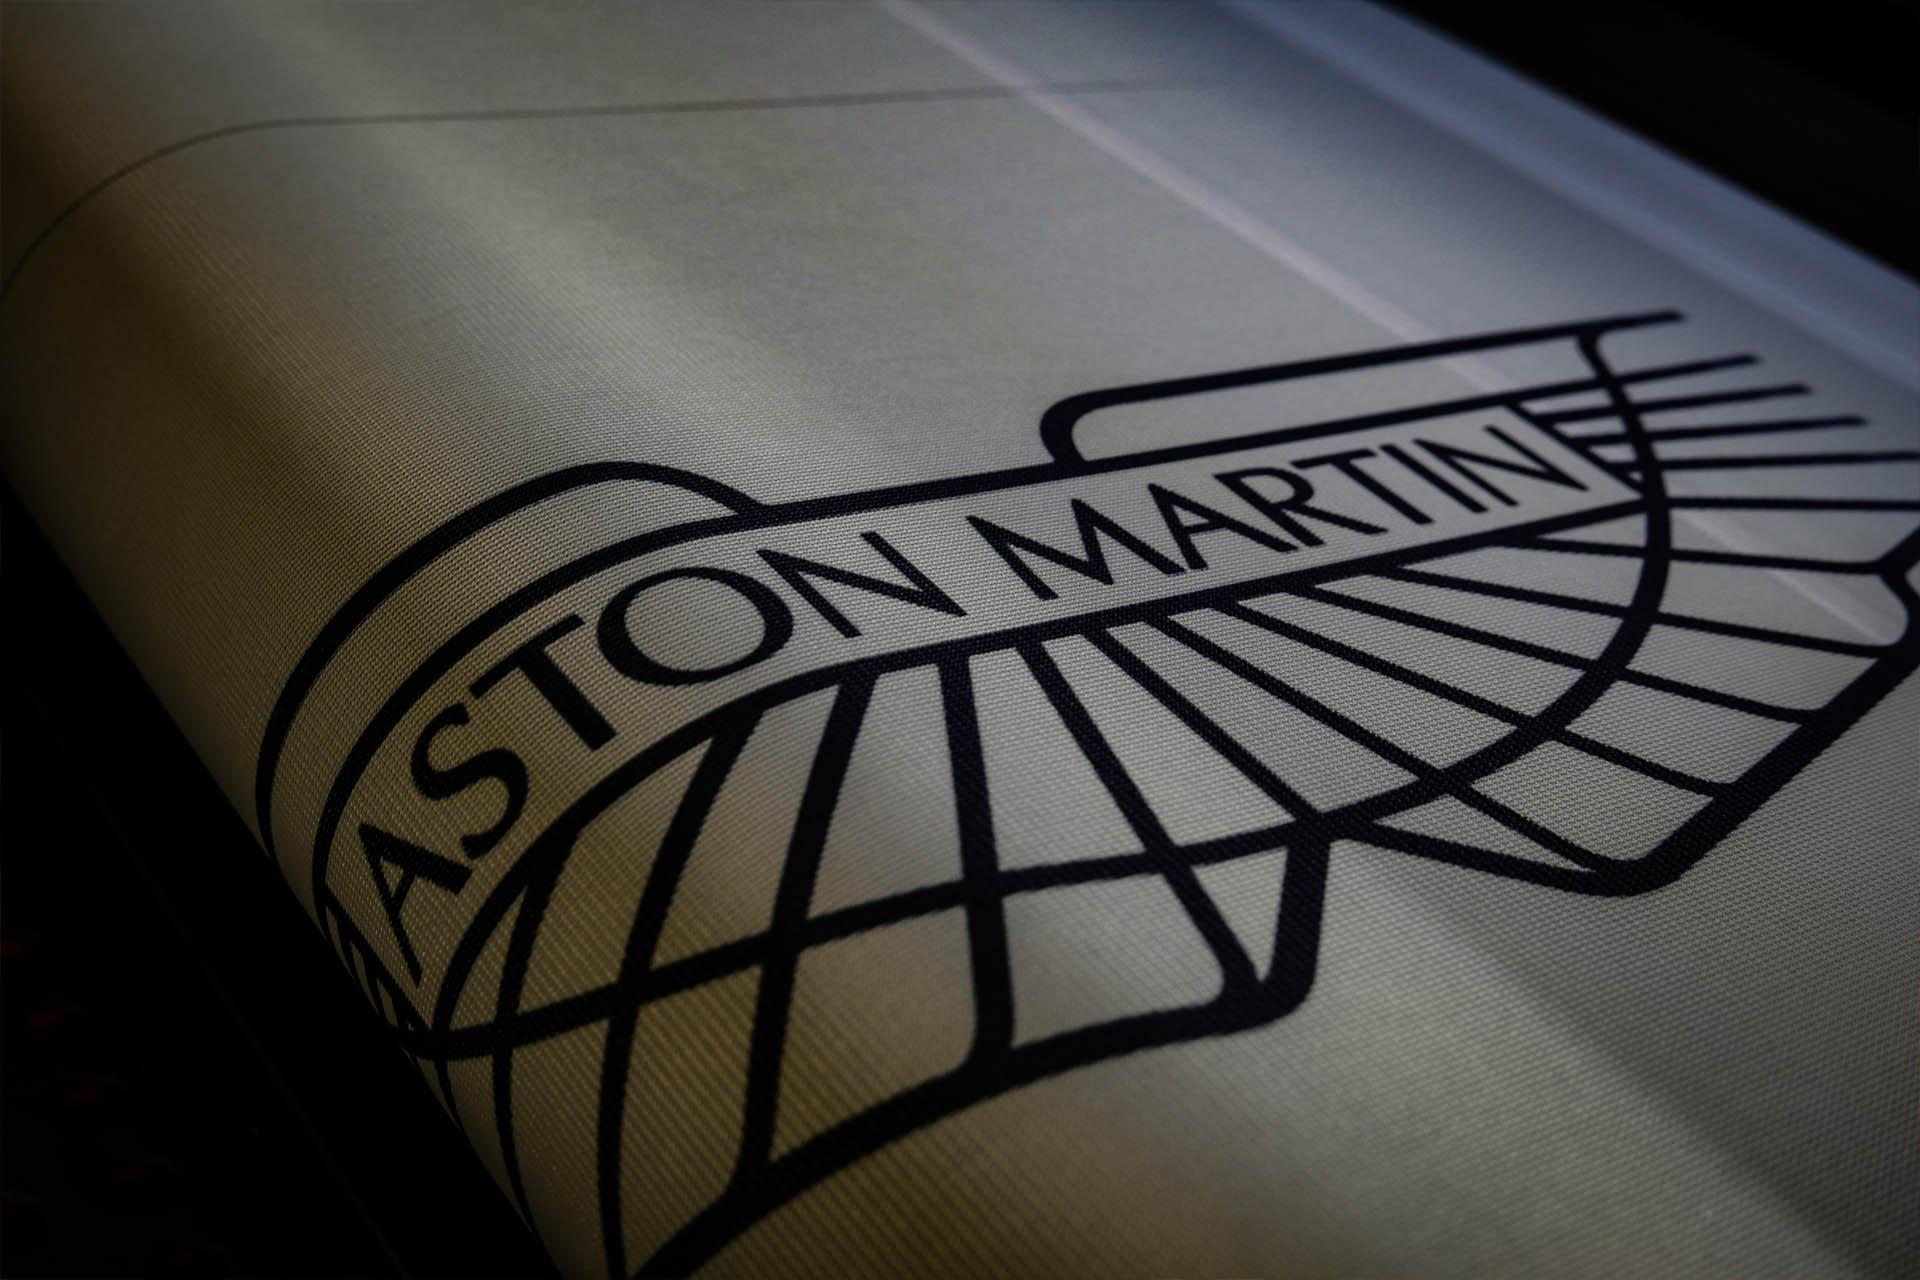 Faber Exposize Aston Martin Fabric Print